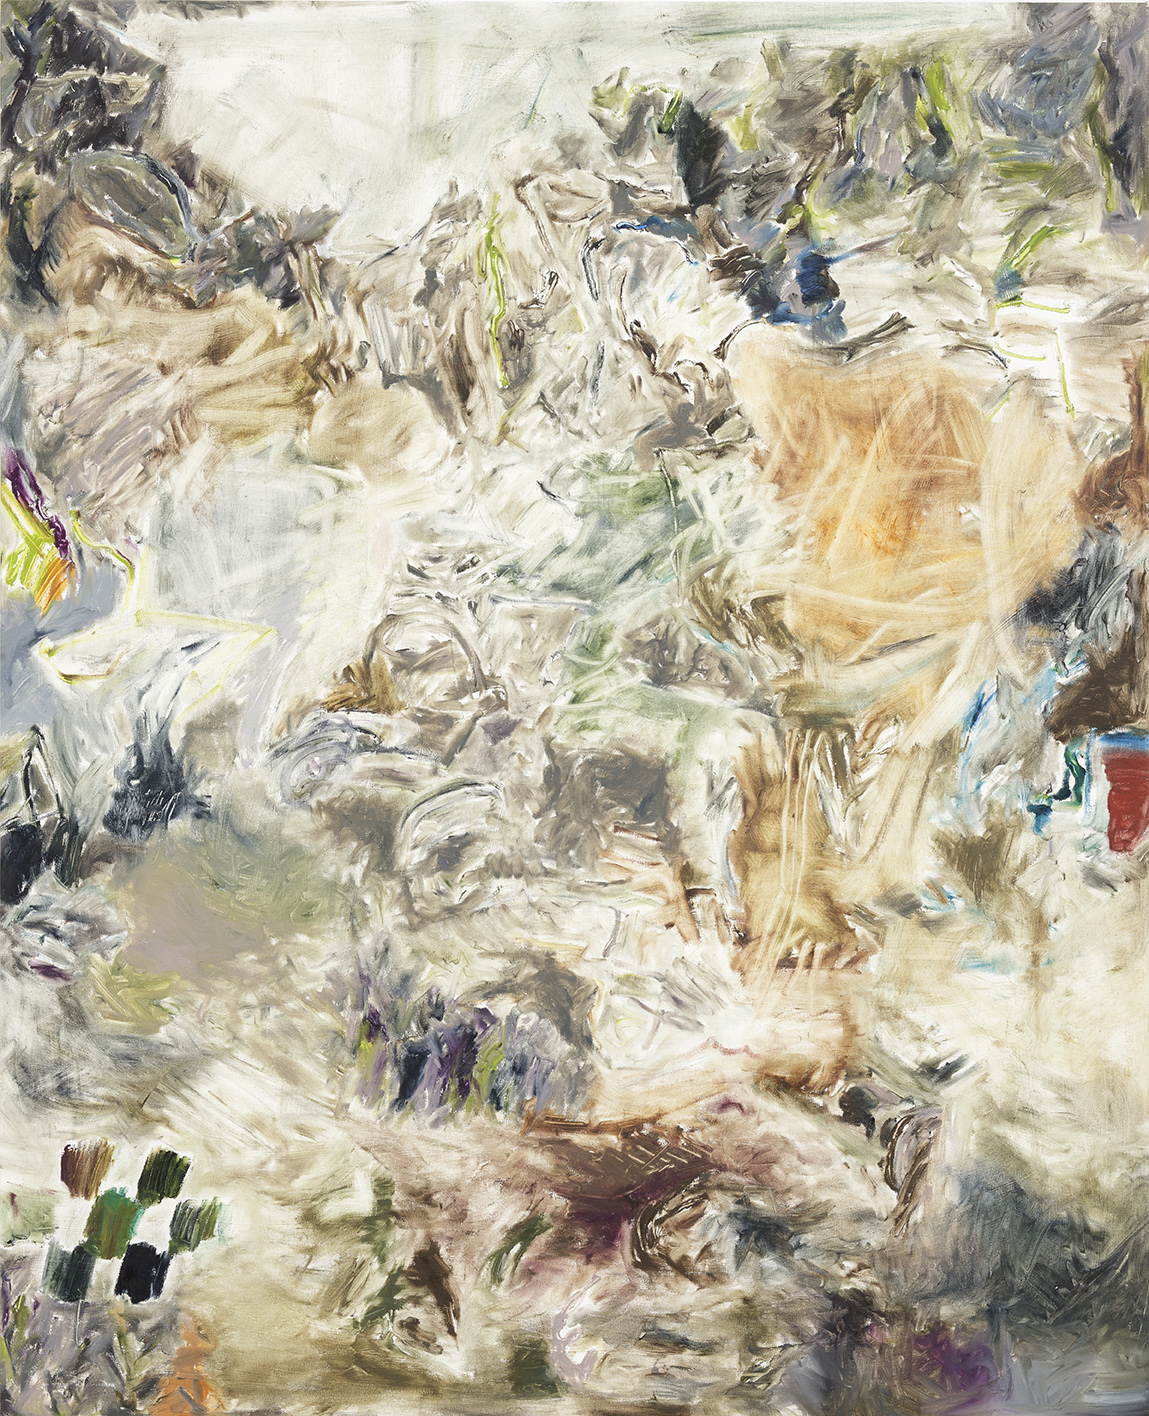 Joaquin Boz. <em>Untitled</em>, 2018. Oil on canvas, 64 1/2 x 52 1/2 inches (163.8 x 133.4 cm)